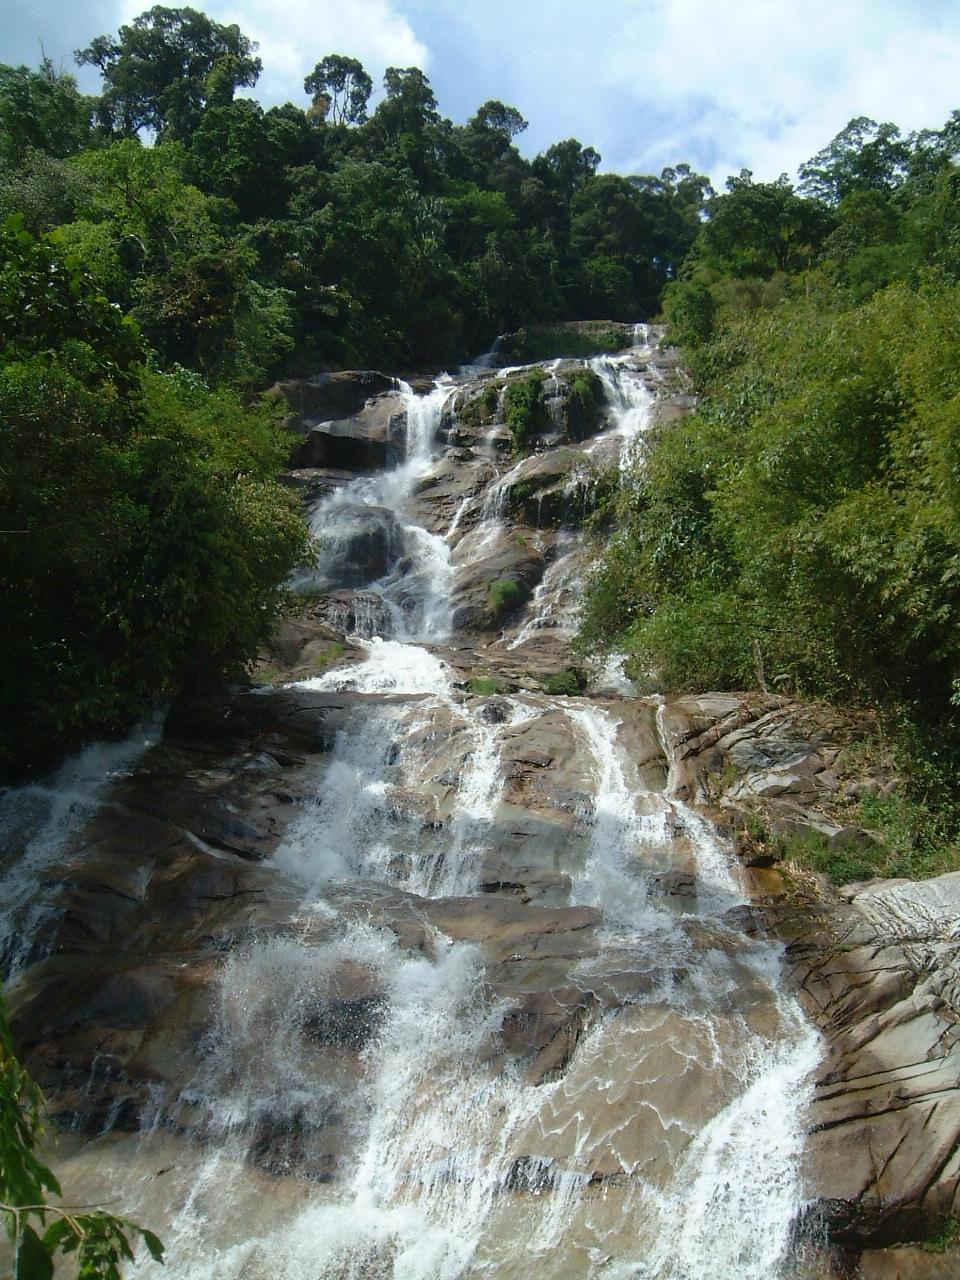 Malaysia Perak Kampar Lata Kinjang Waterfall Mar 2001 17